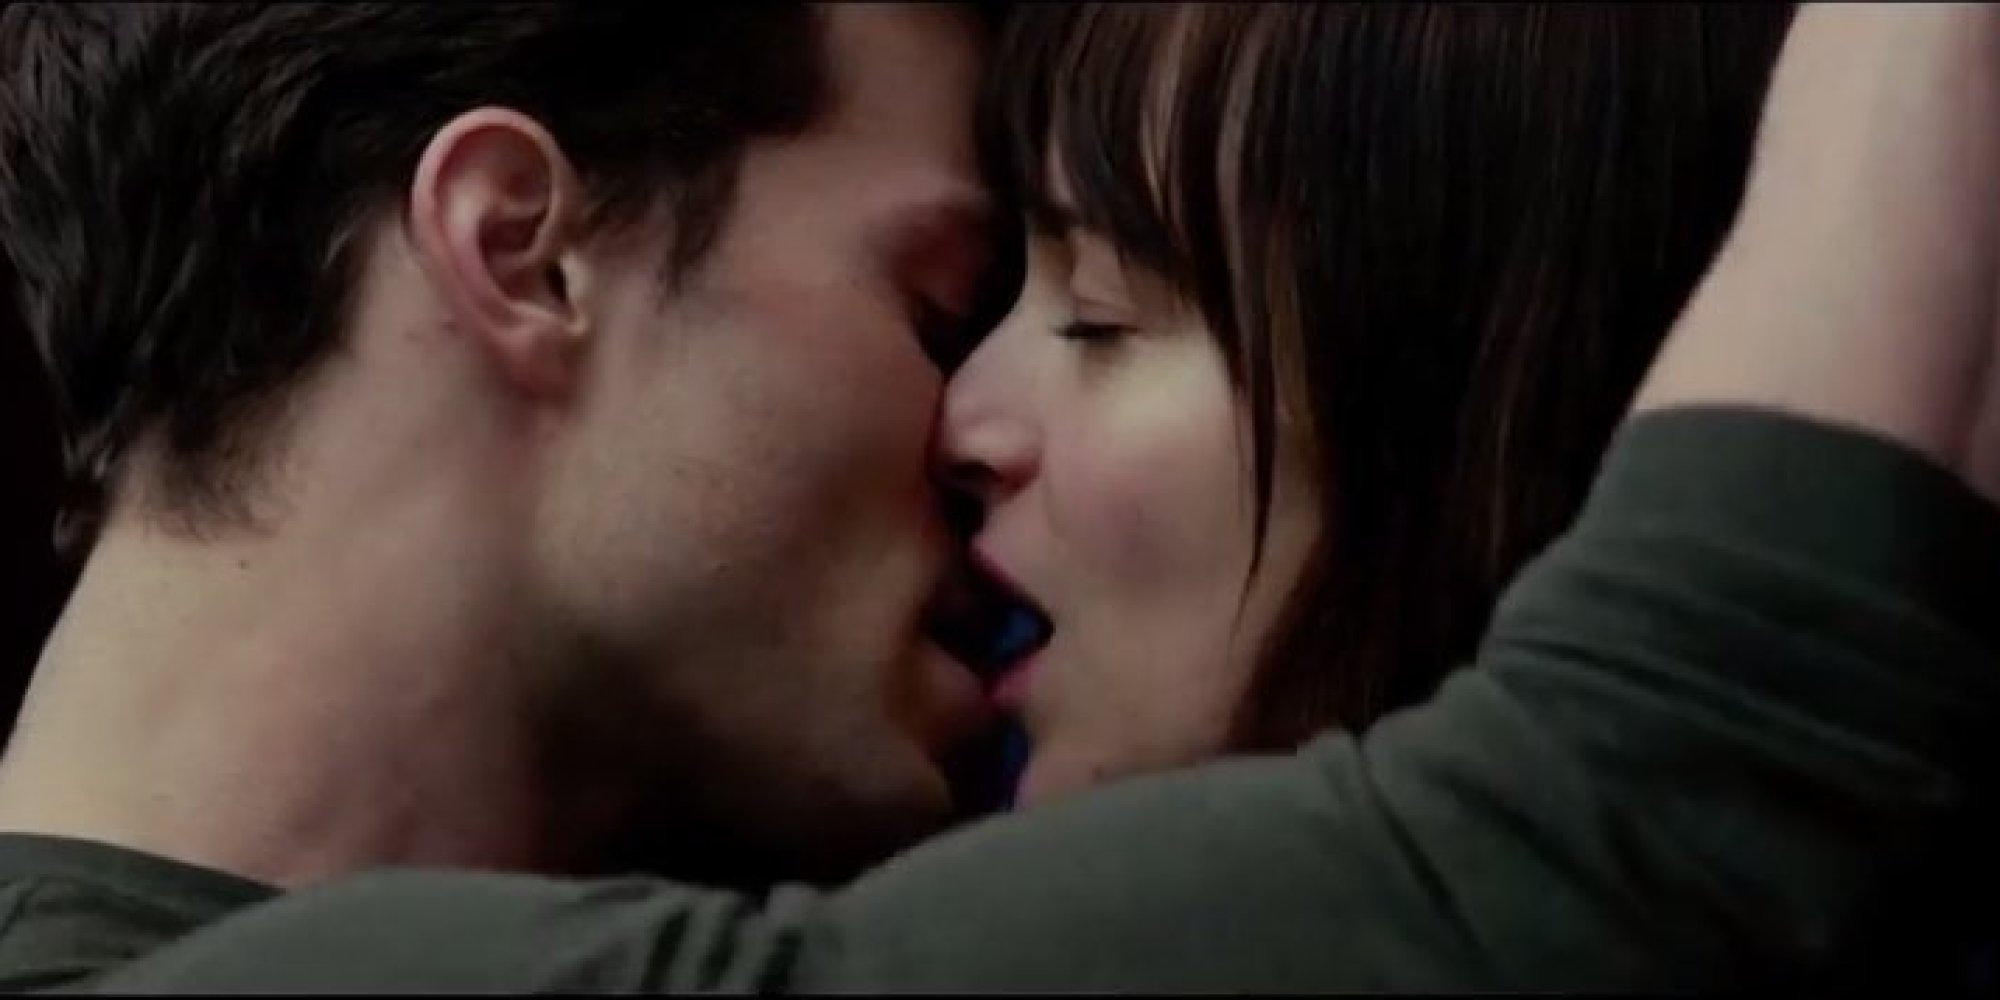 50 shades of grey sex scene